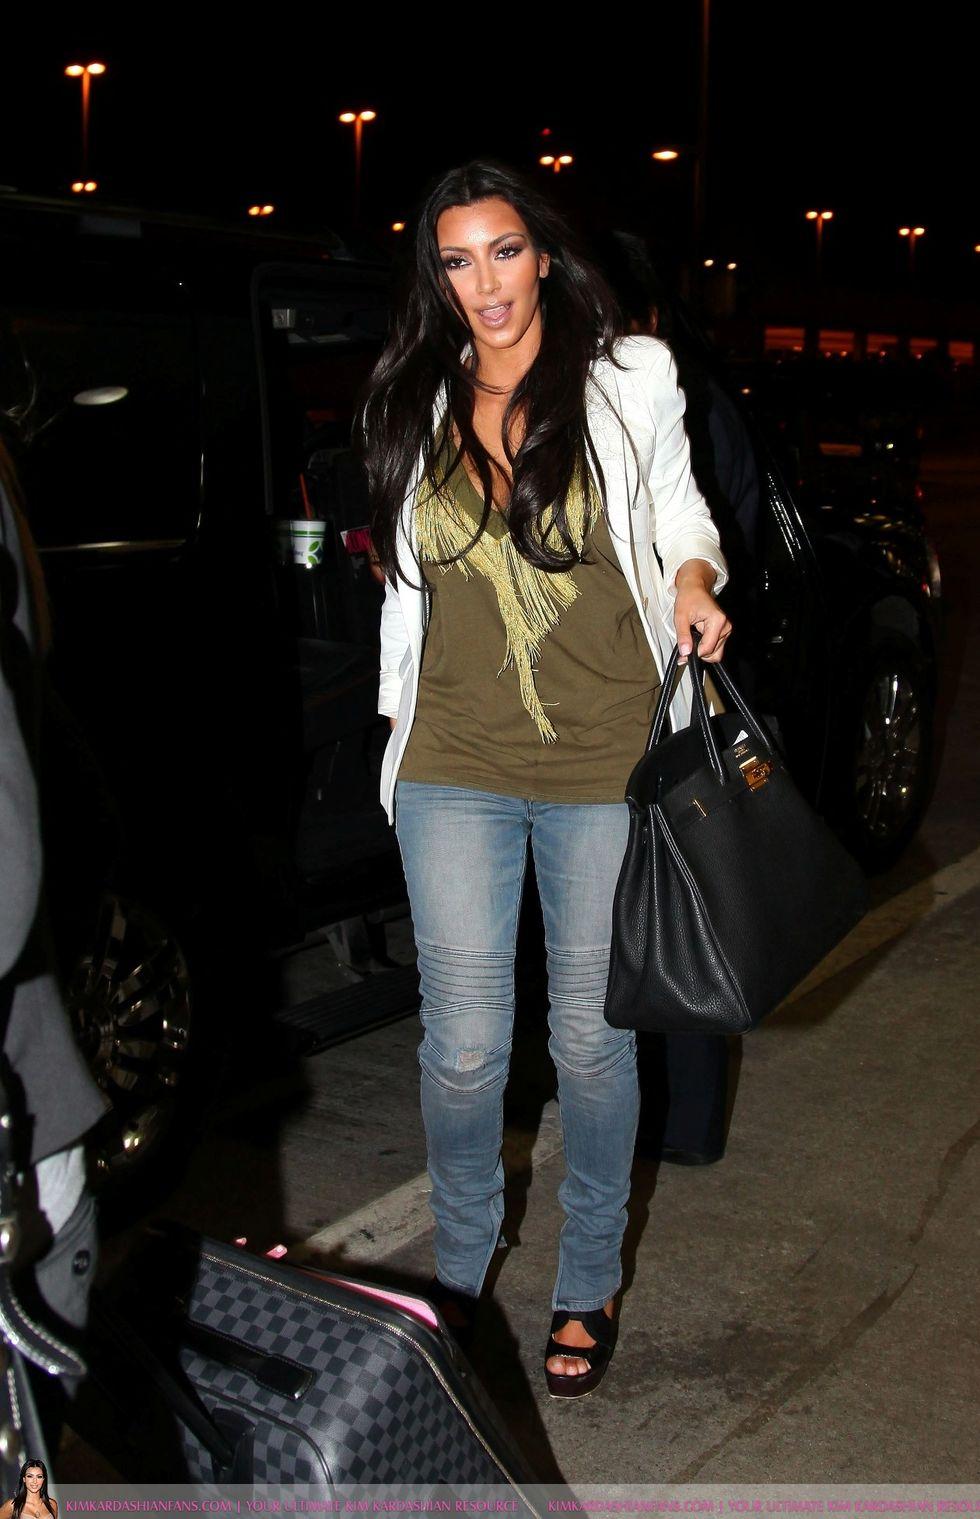 Kim Kardashian 2010 : kim-kardashian-at-lax-airport-in-beverly-hills-06